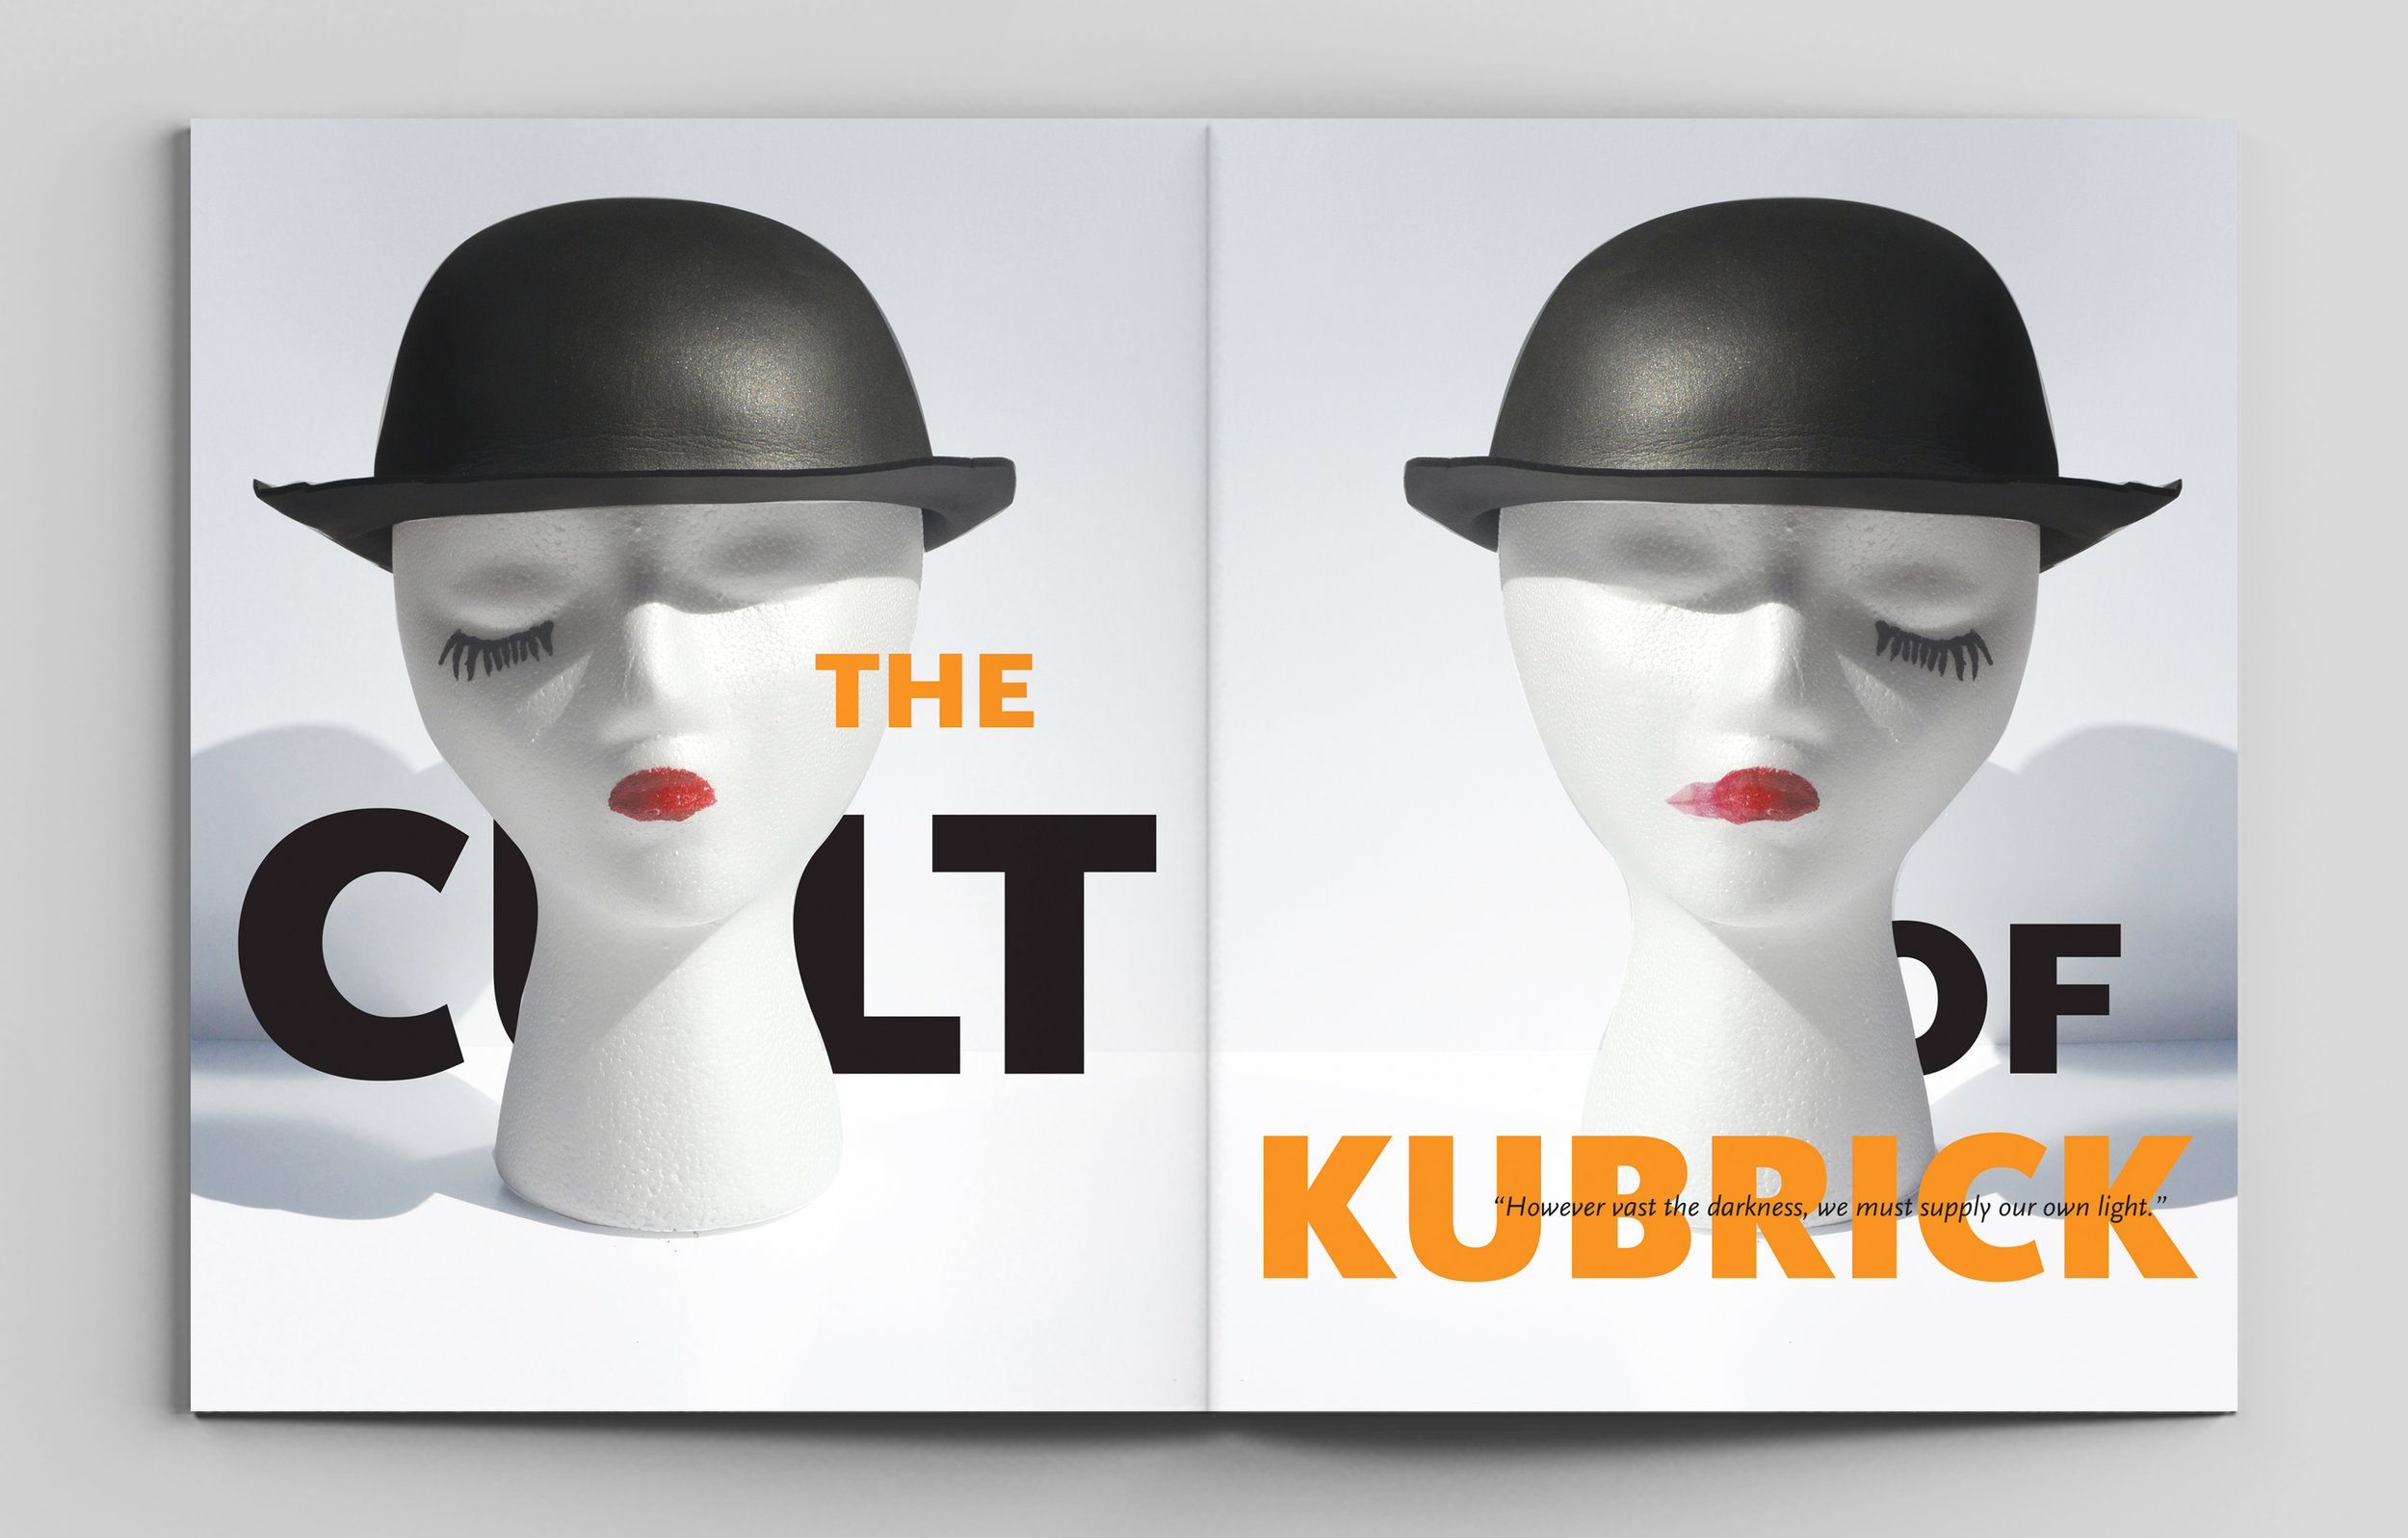 kubrick_article_spread.jpg